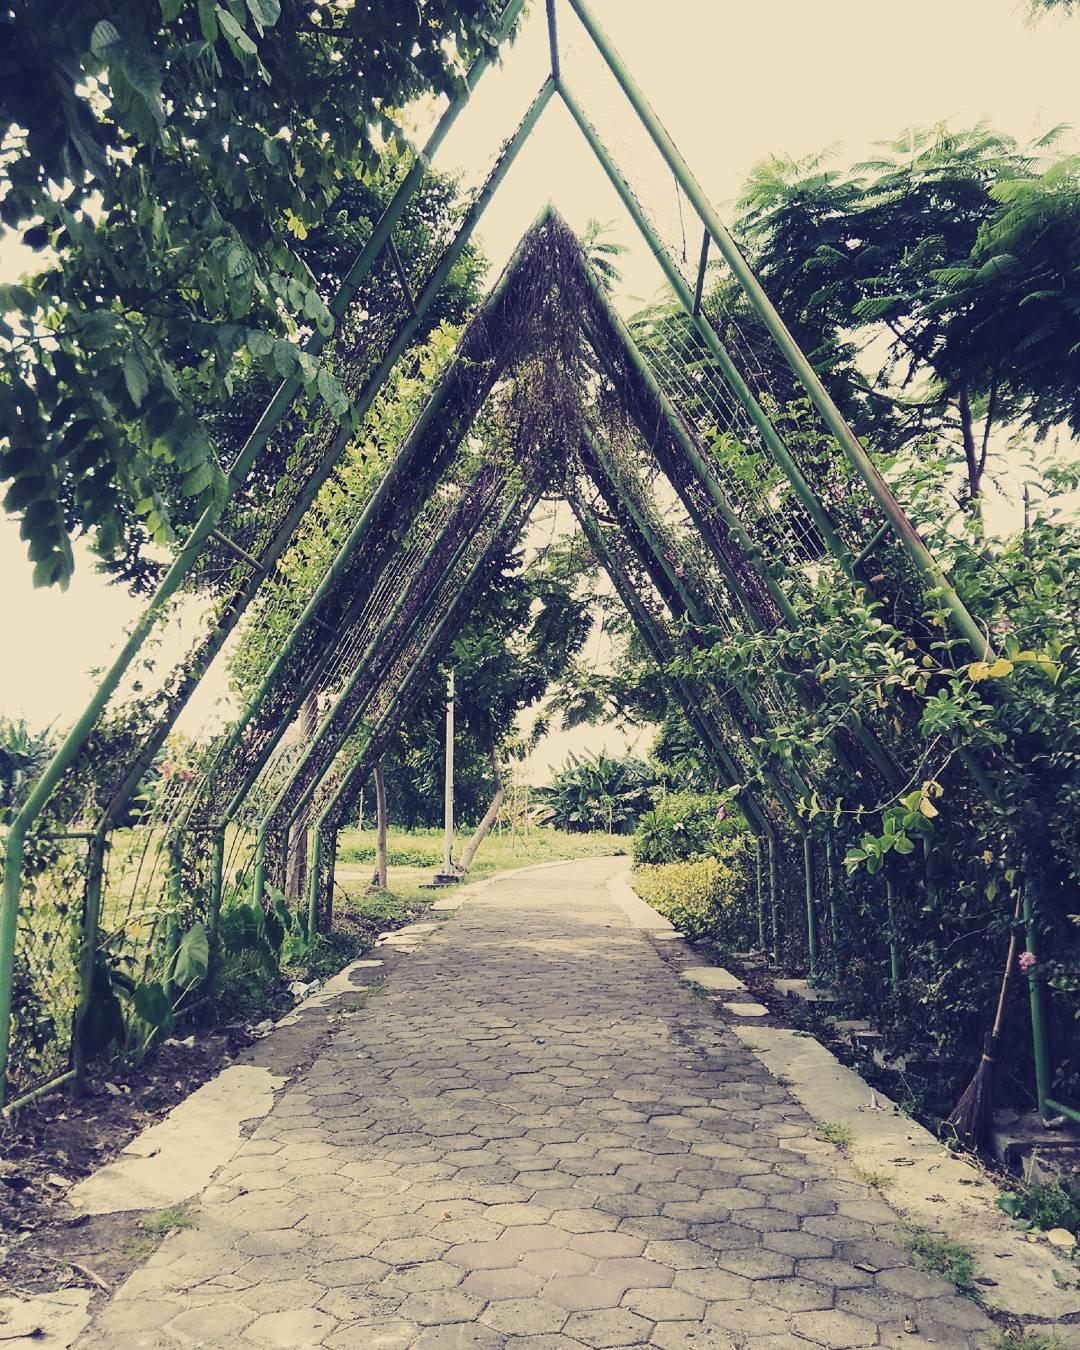 Hutan Bambu Keputih Tpa Berubah Jadi Tempat Wisata Taman Sakura